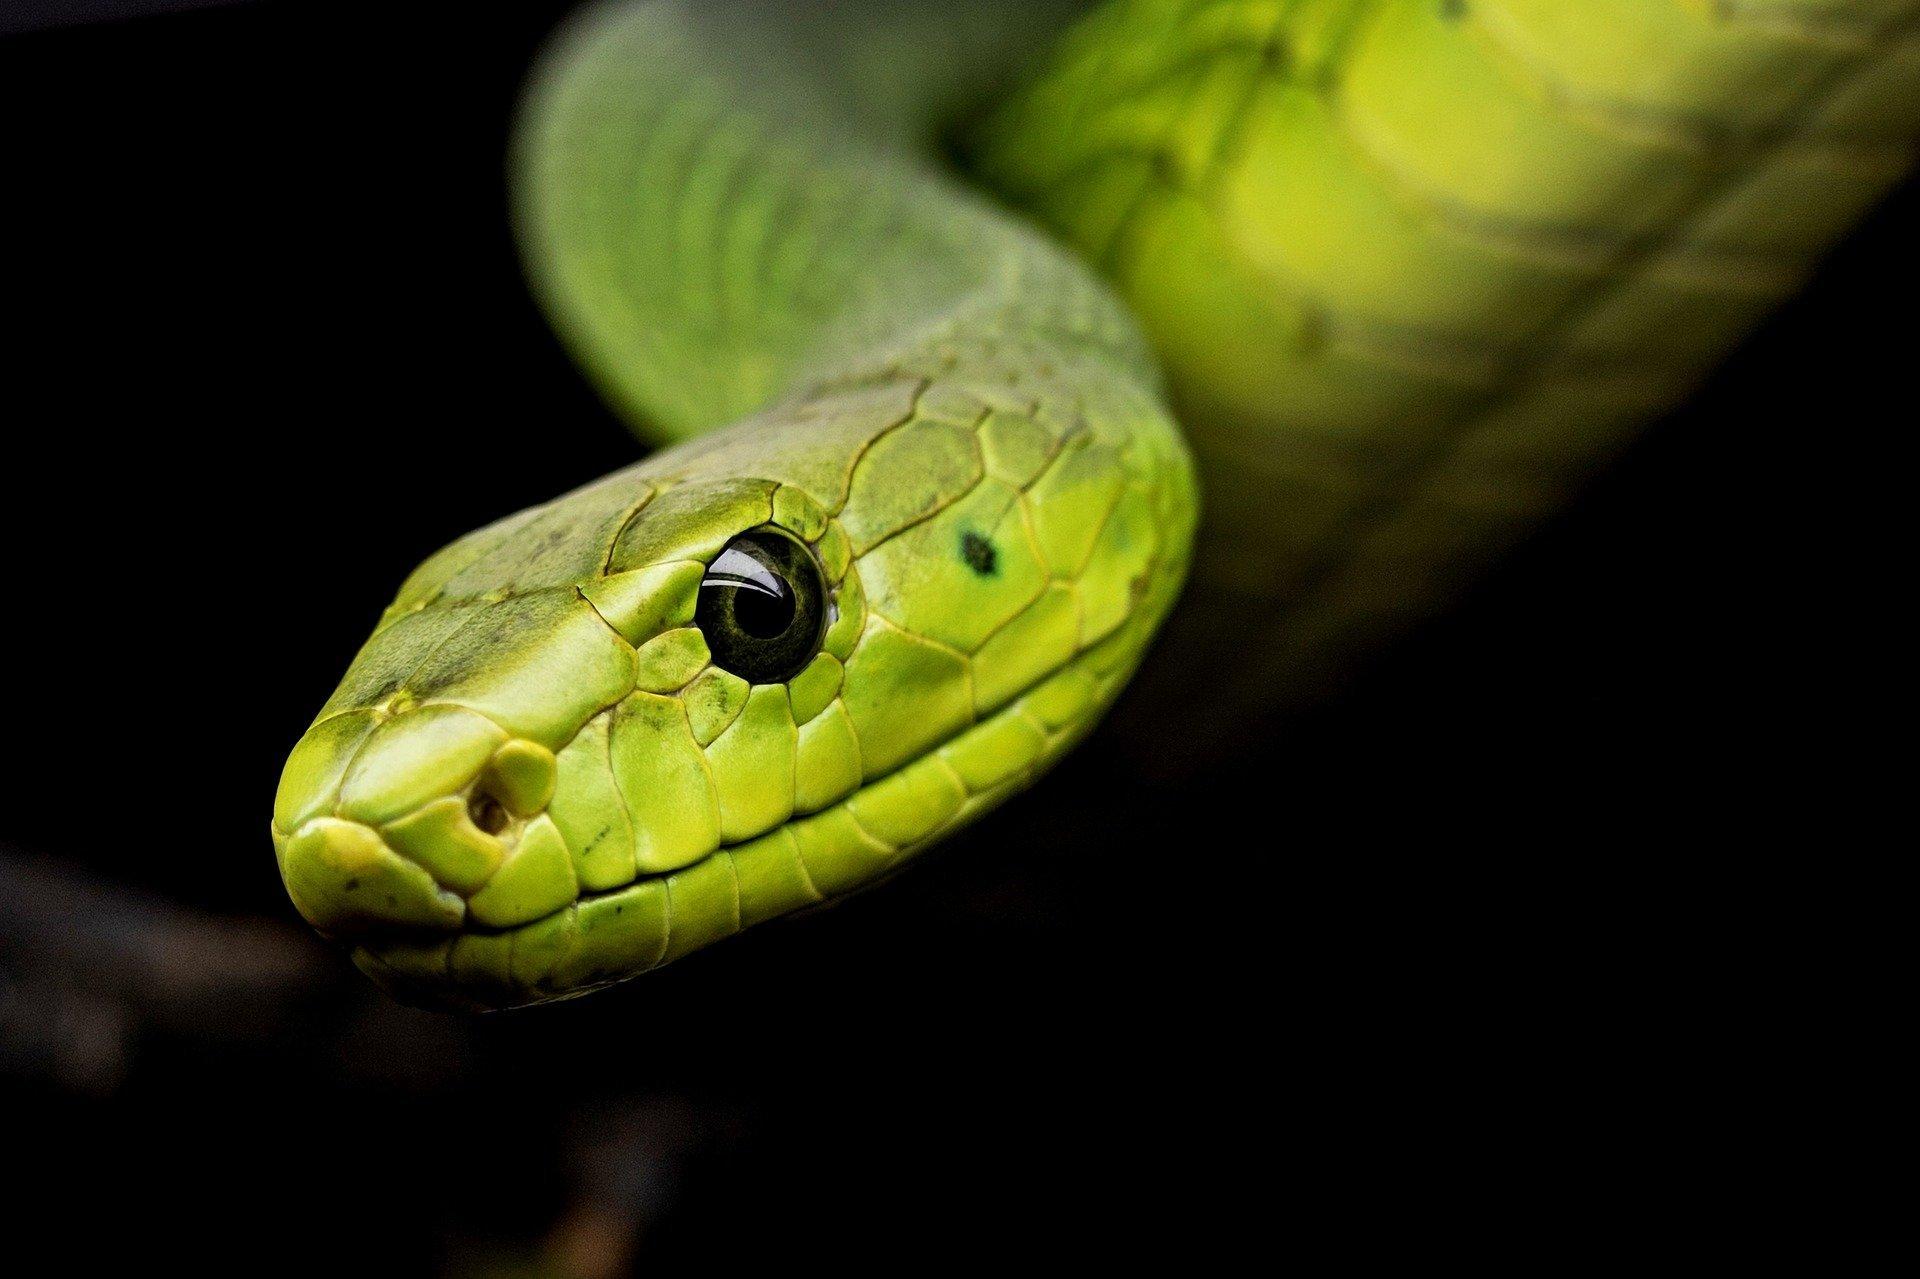 Giant Snake Washes Up On Shore, See The Shocking Photo